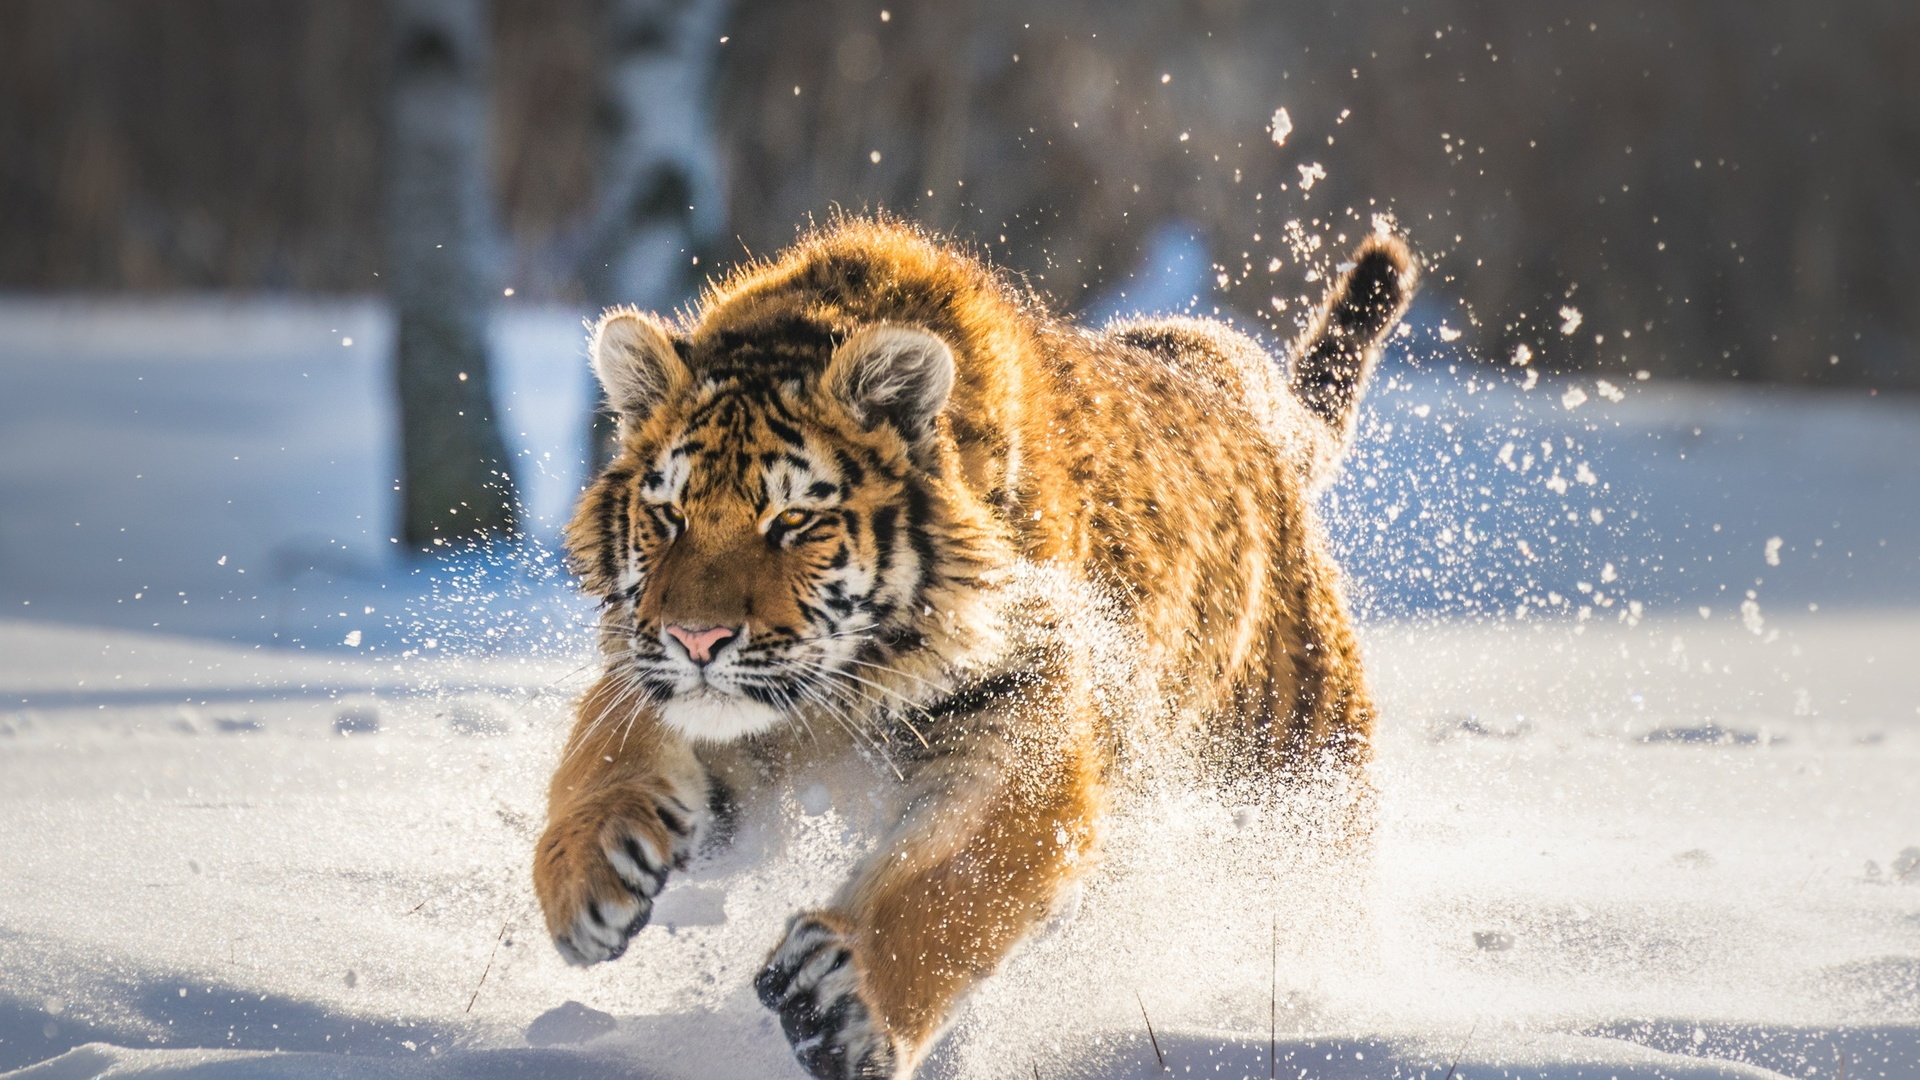 1920x1080 Cute Tiger Cub Running Laptop Full HD 1080P HD ...